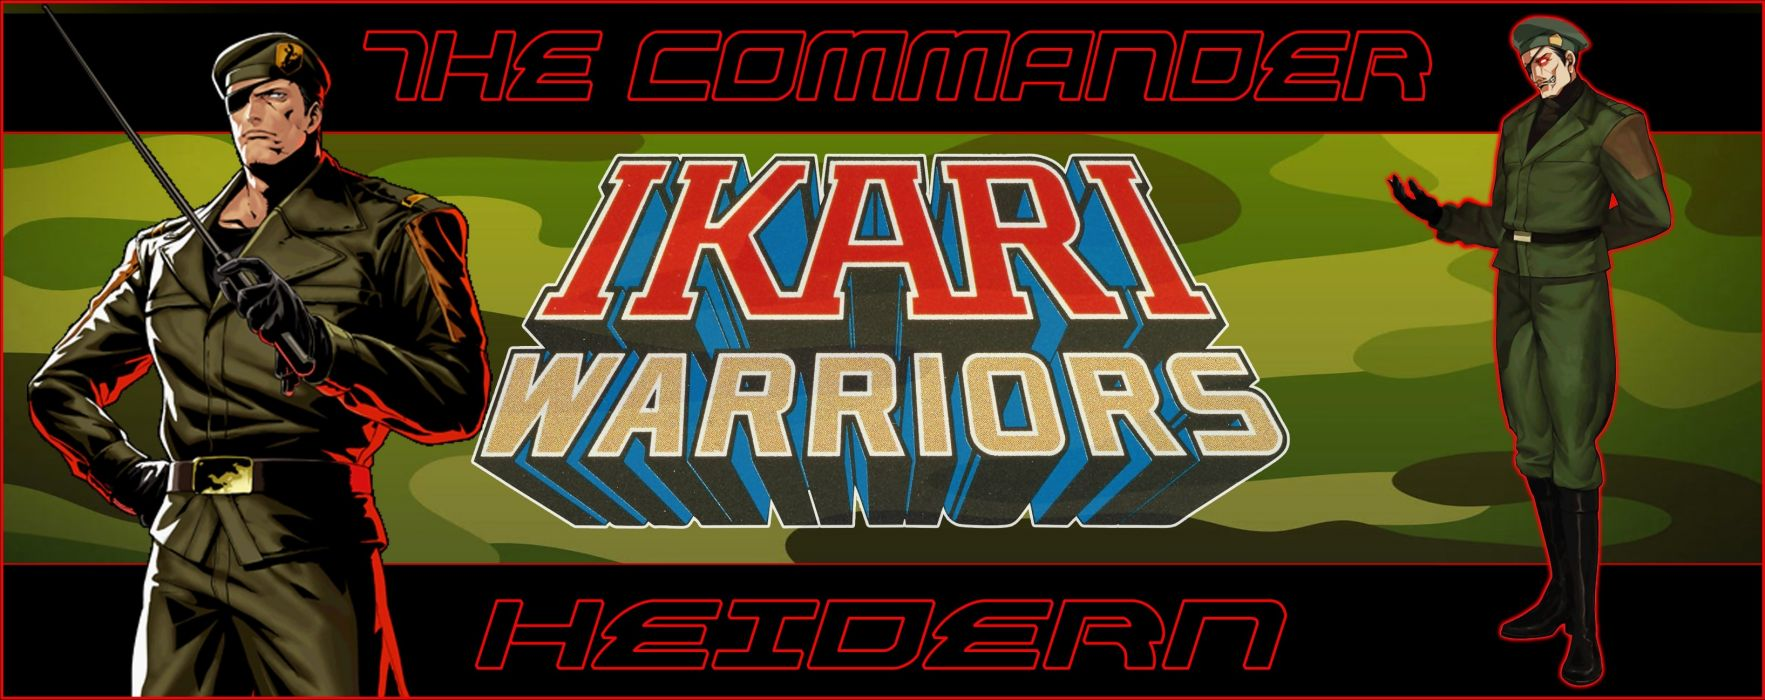 King of Fighters Commander of Ikari Warrior wallpaper